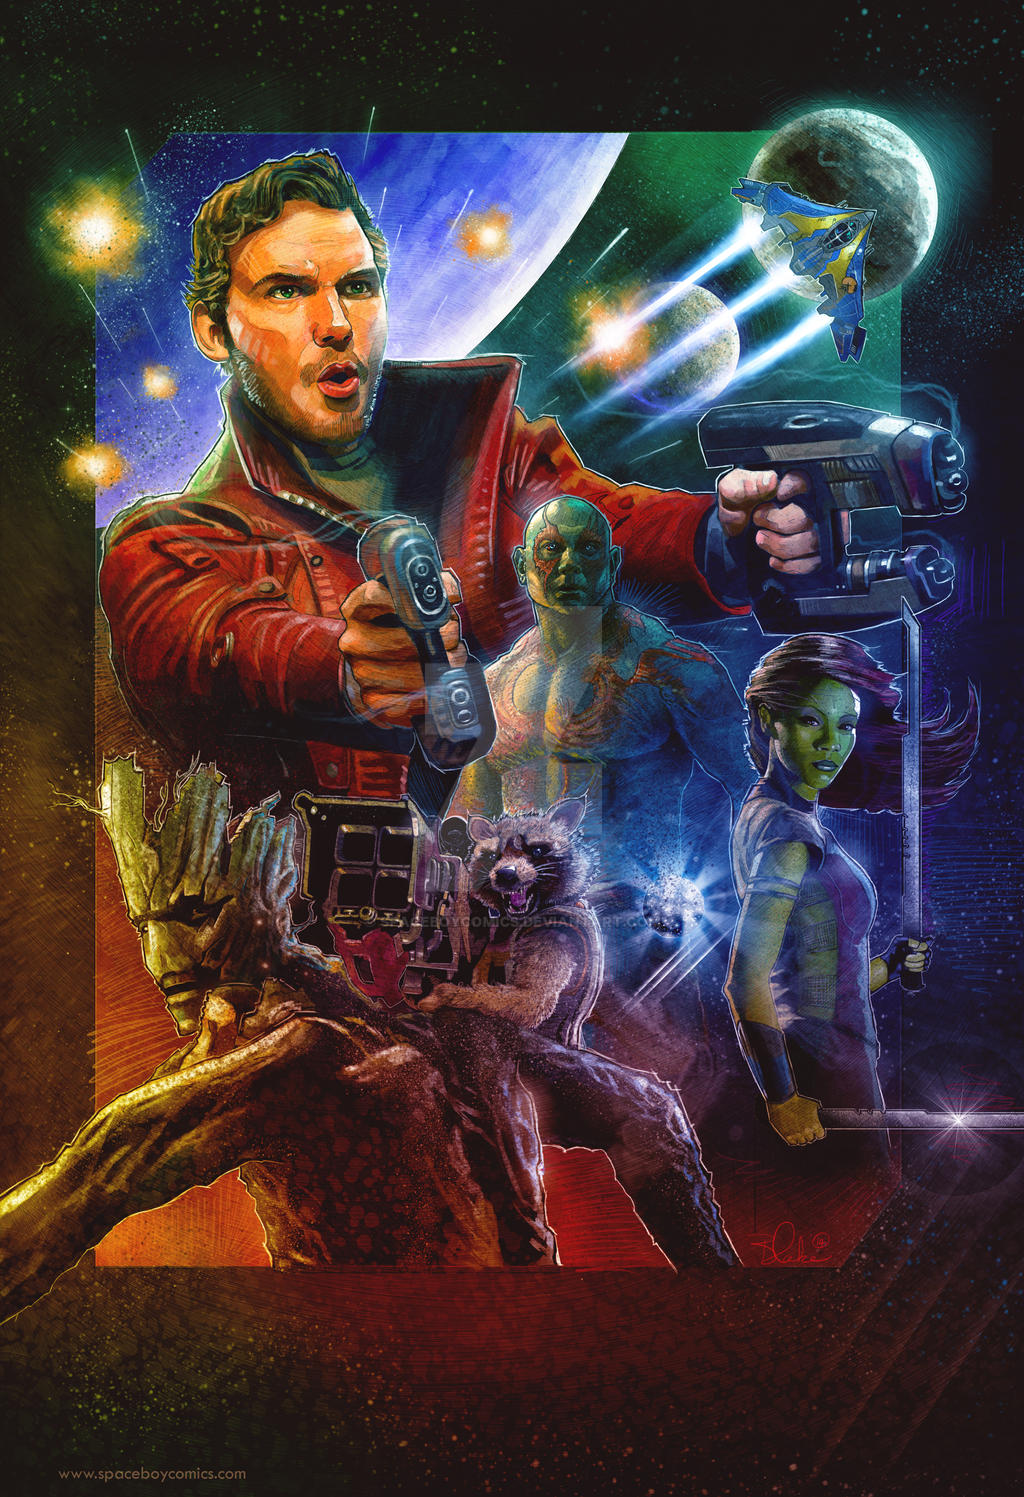 Guardians of the Galaxy Fan Art Poster